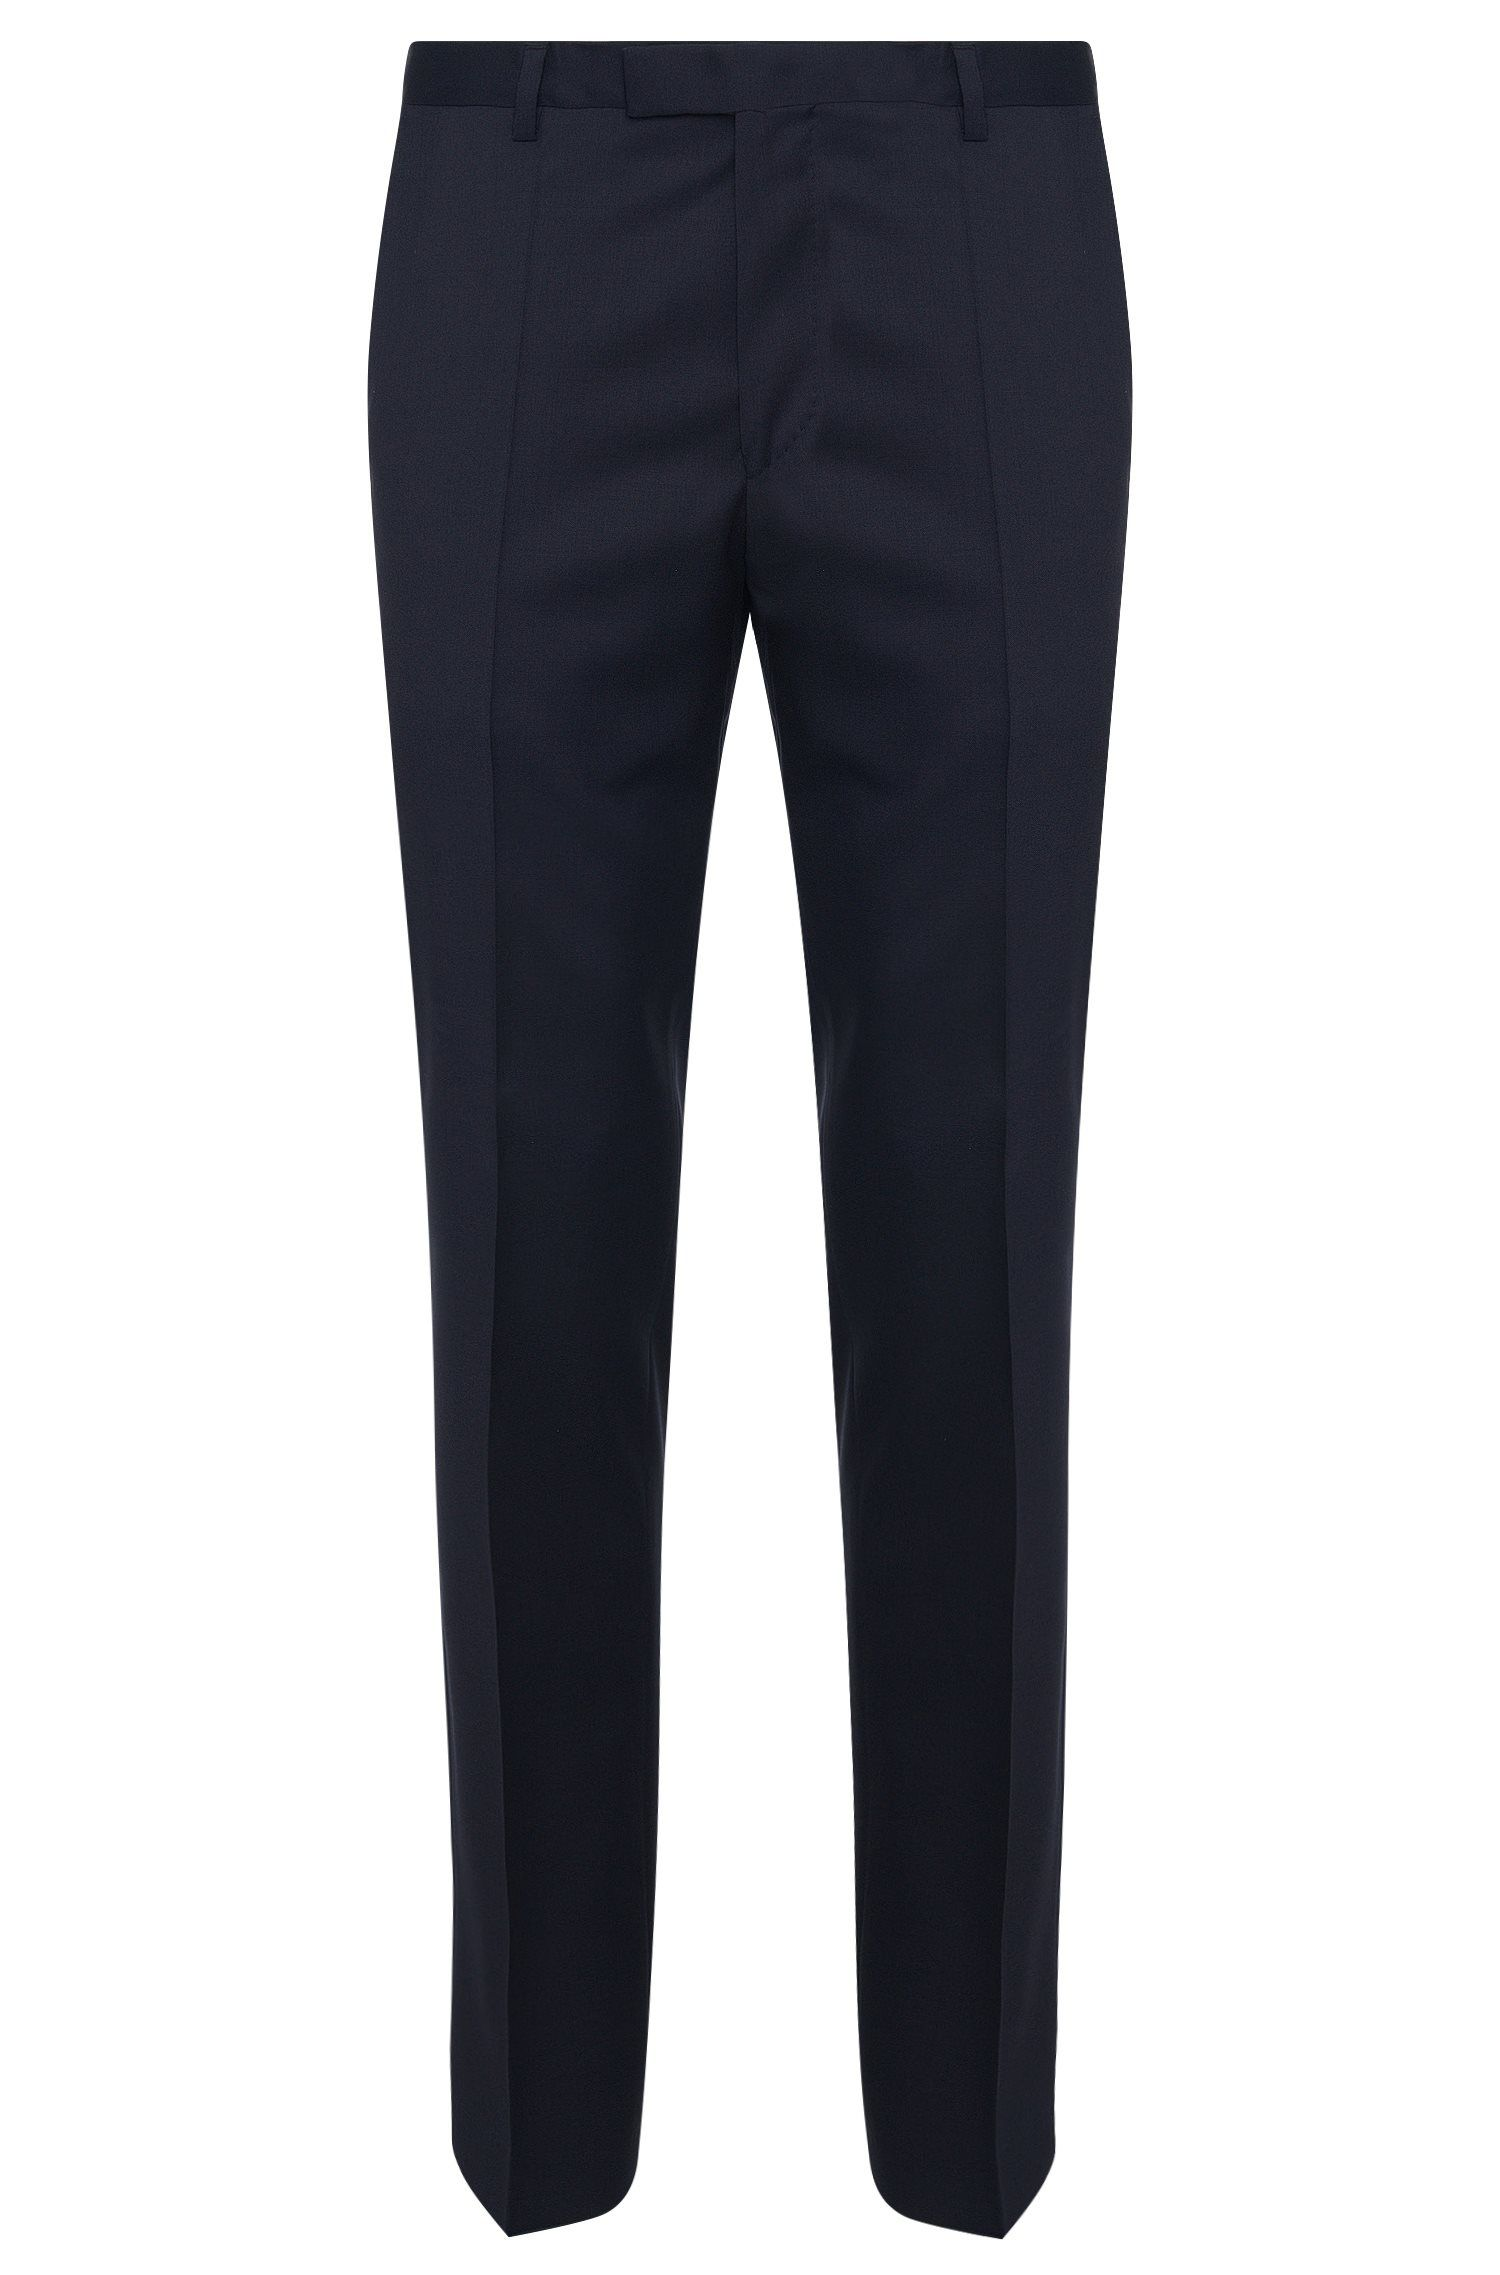 'Lenon Cyl' | Regular Fit, Virgin Wool Dress Pants